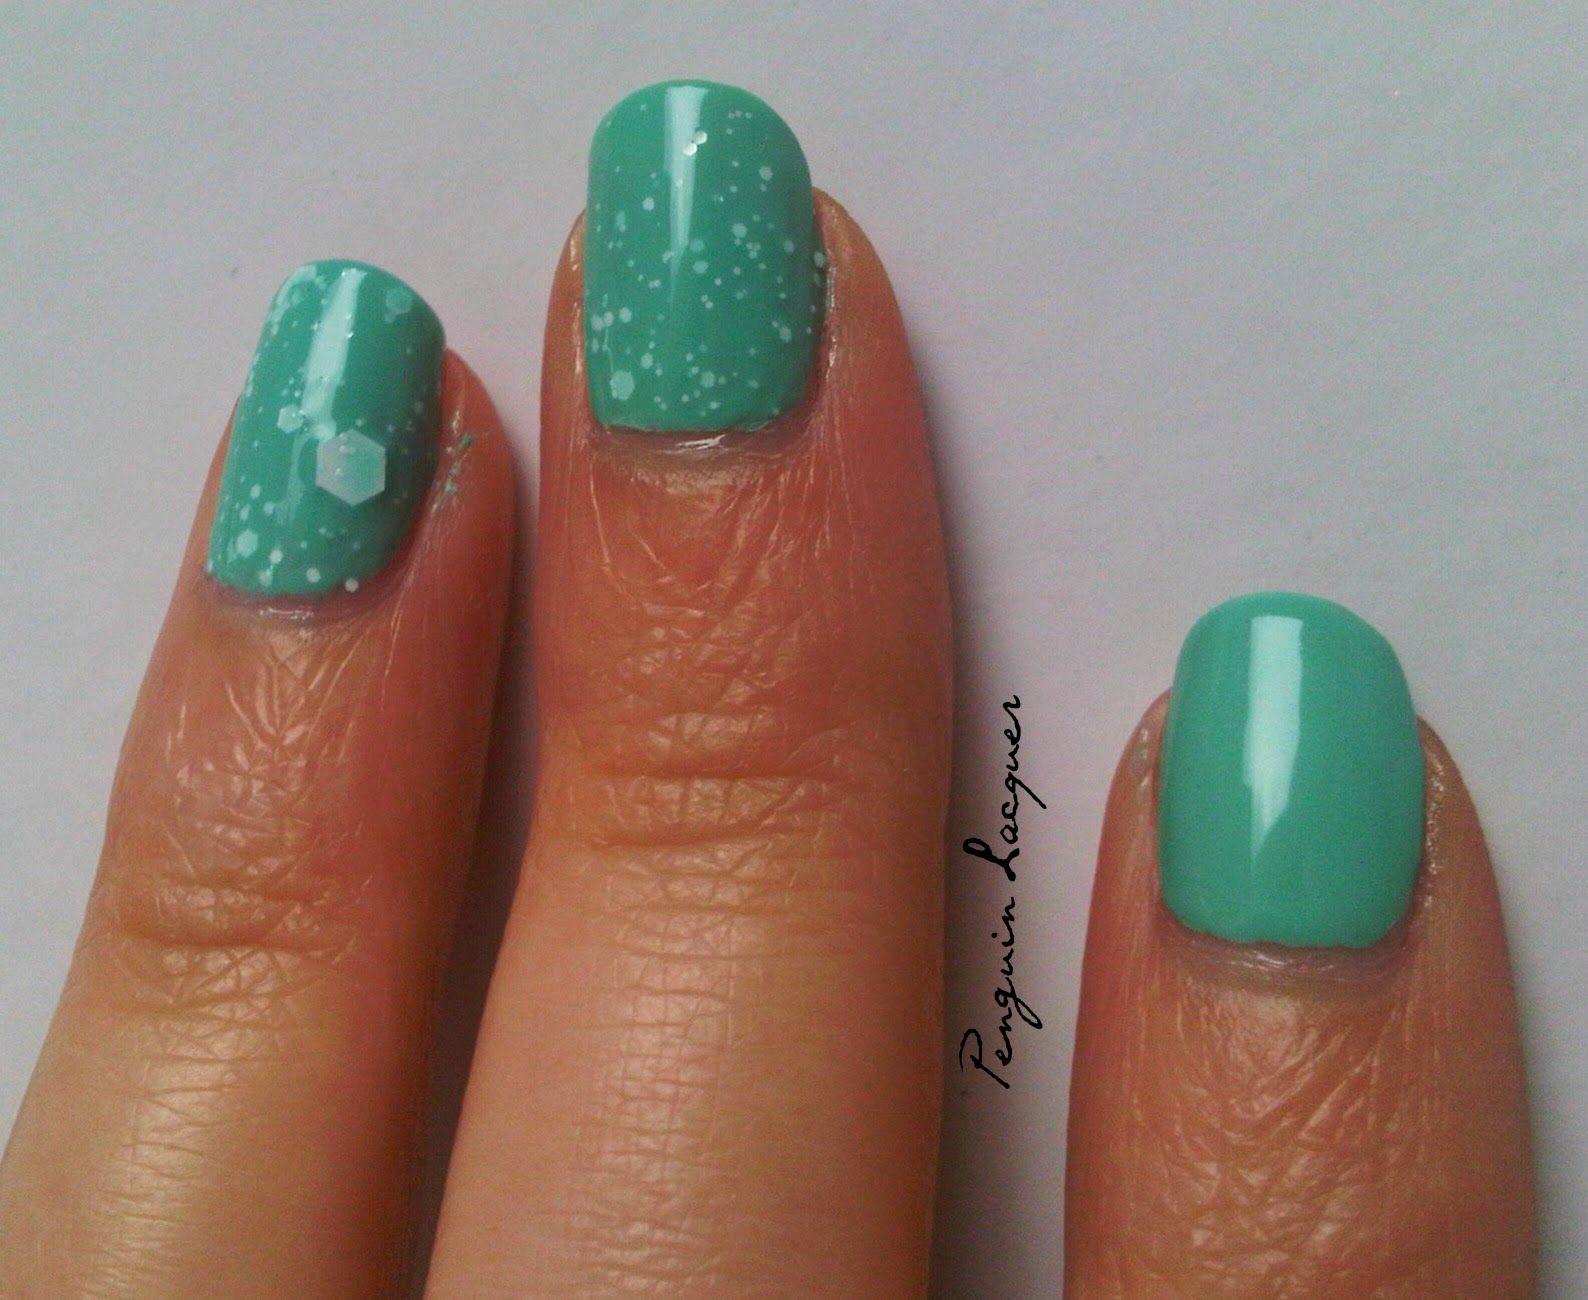 Maybelline Acid Washs: Mint Acid-tittude http://penguinlacquer.blogspot.de/2014/07/schaumbad-in-mint.html #maybelline